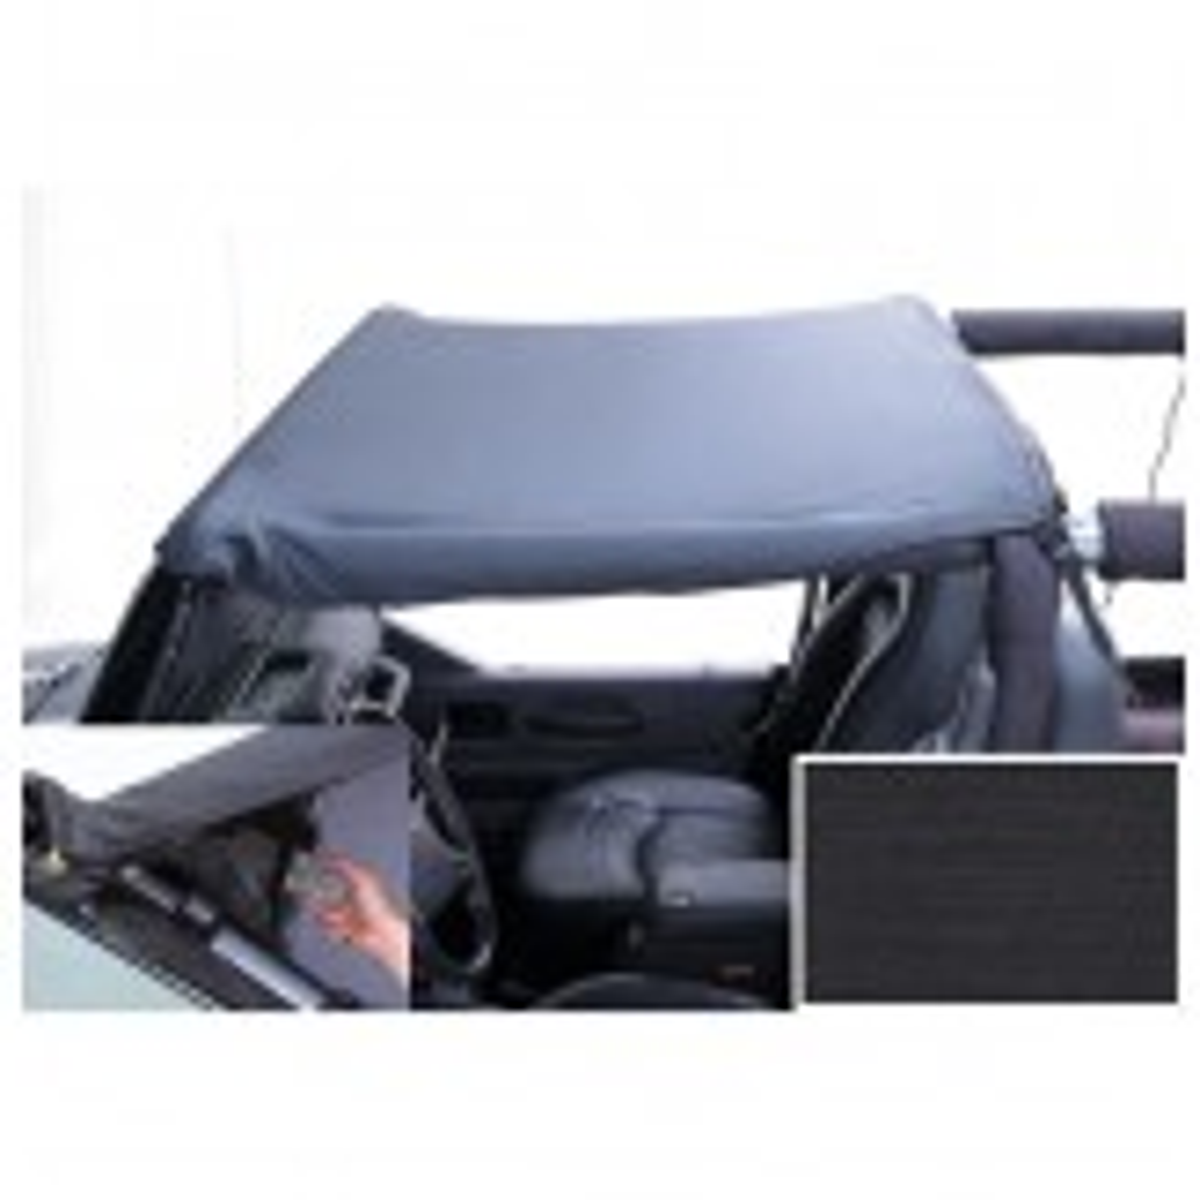 Pocket Brief Top, Black Diamond; 97-06 Jeep Wrangler TJ